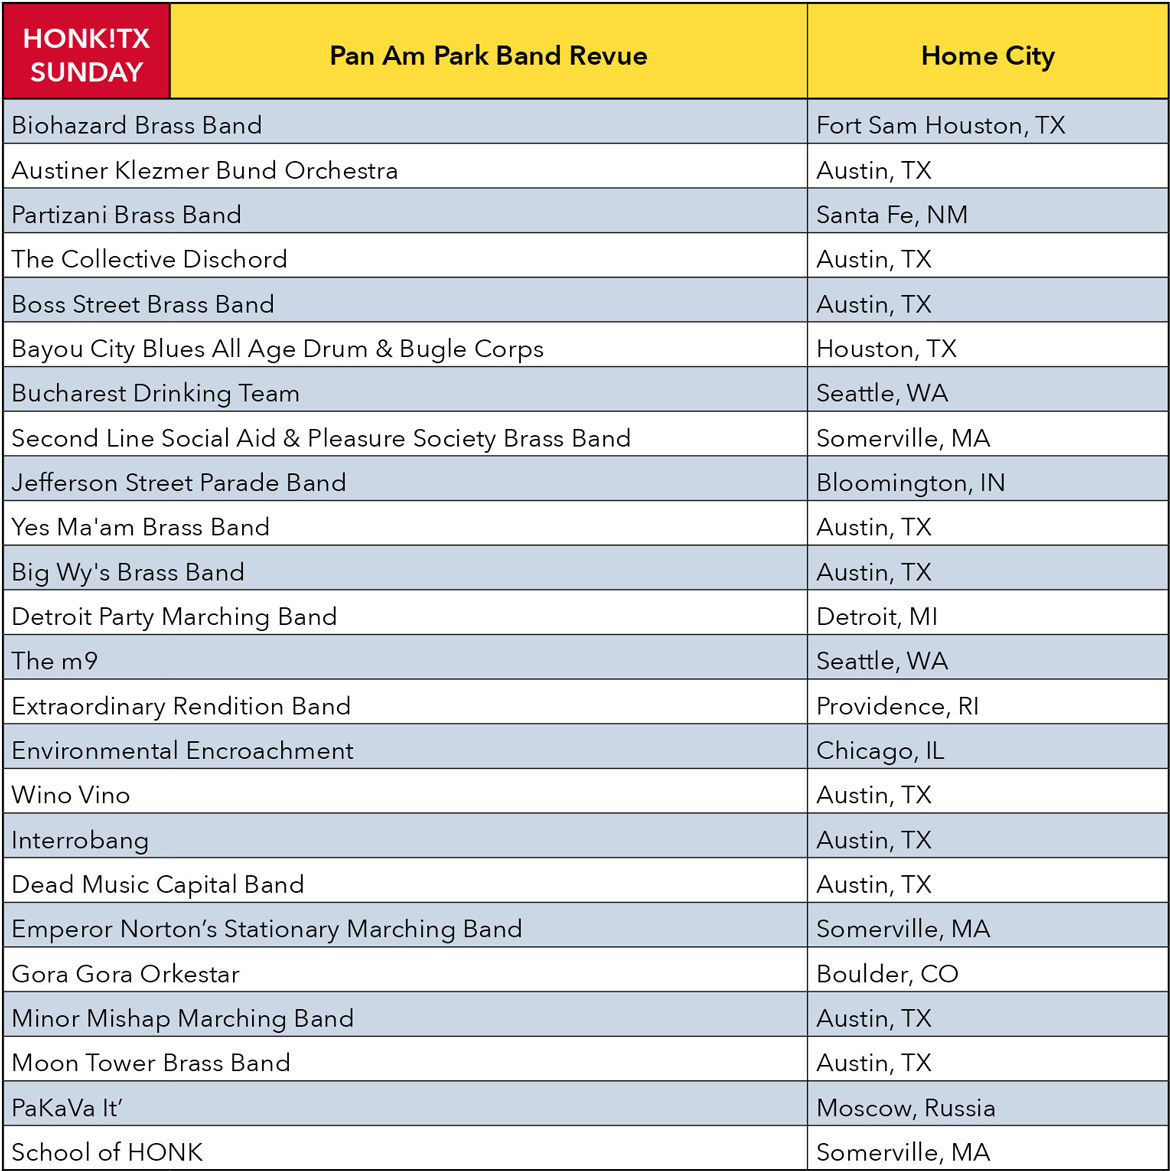 HONK!TX Sunday Schedule